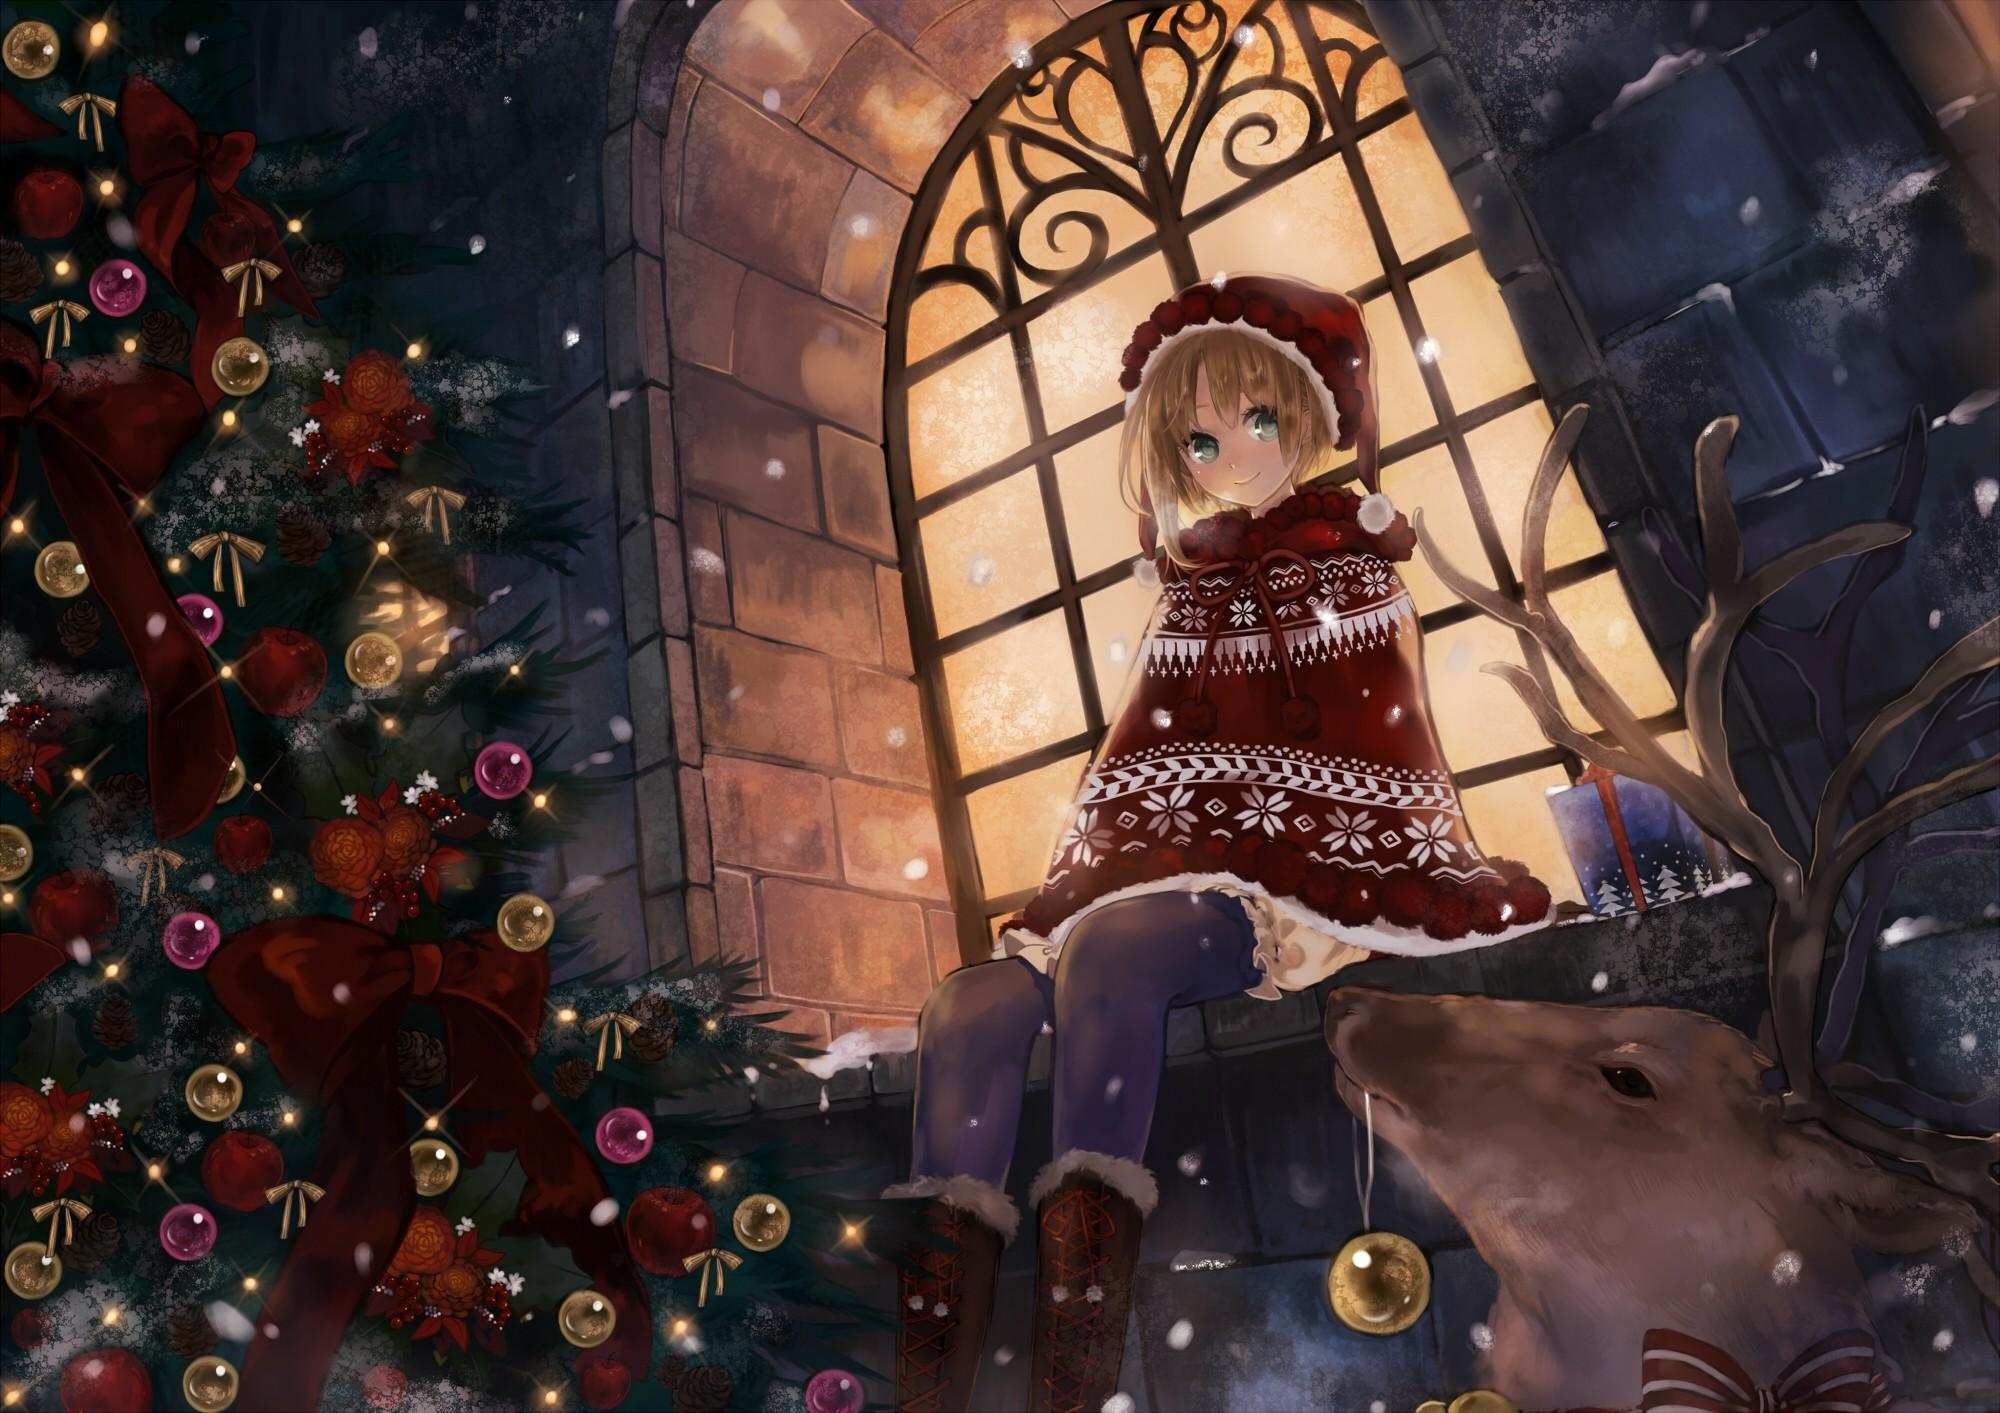 … Anime Christmas Wallpaper 71 Christmas Hd Wallpapers Backgrounds  Wallpaper Ass …